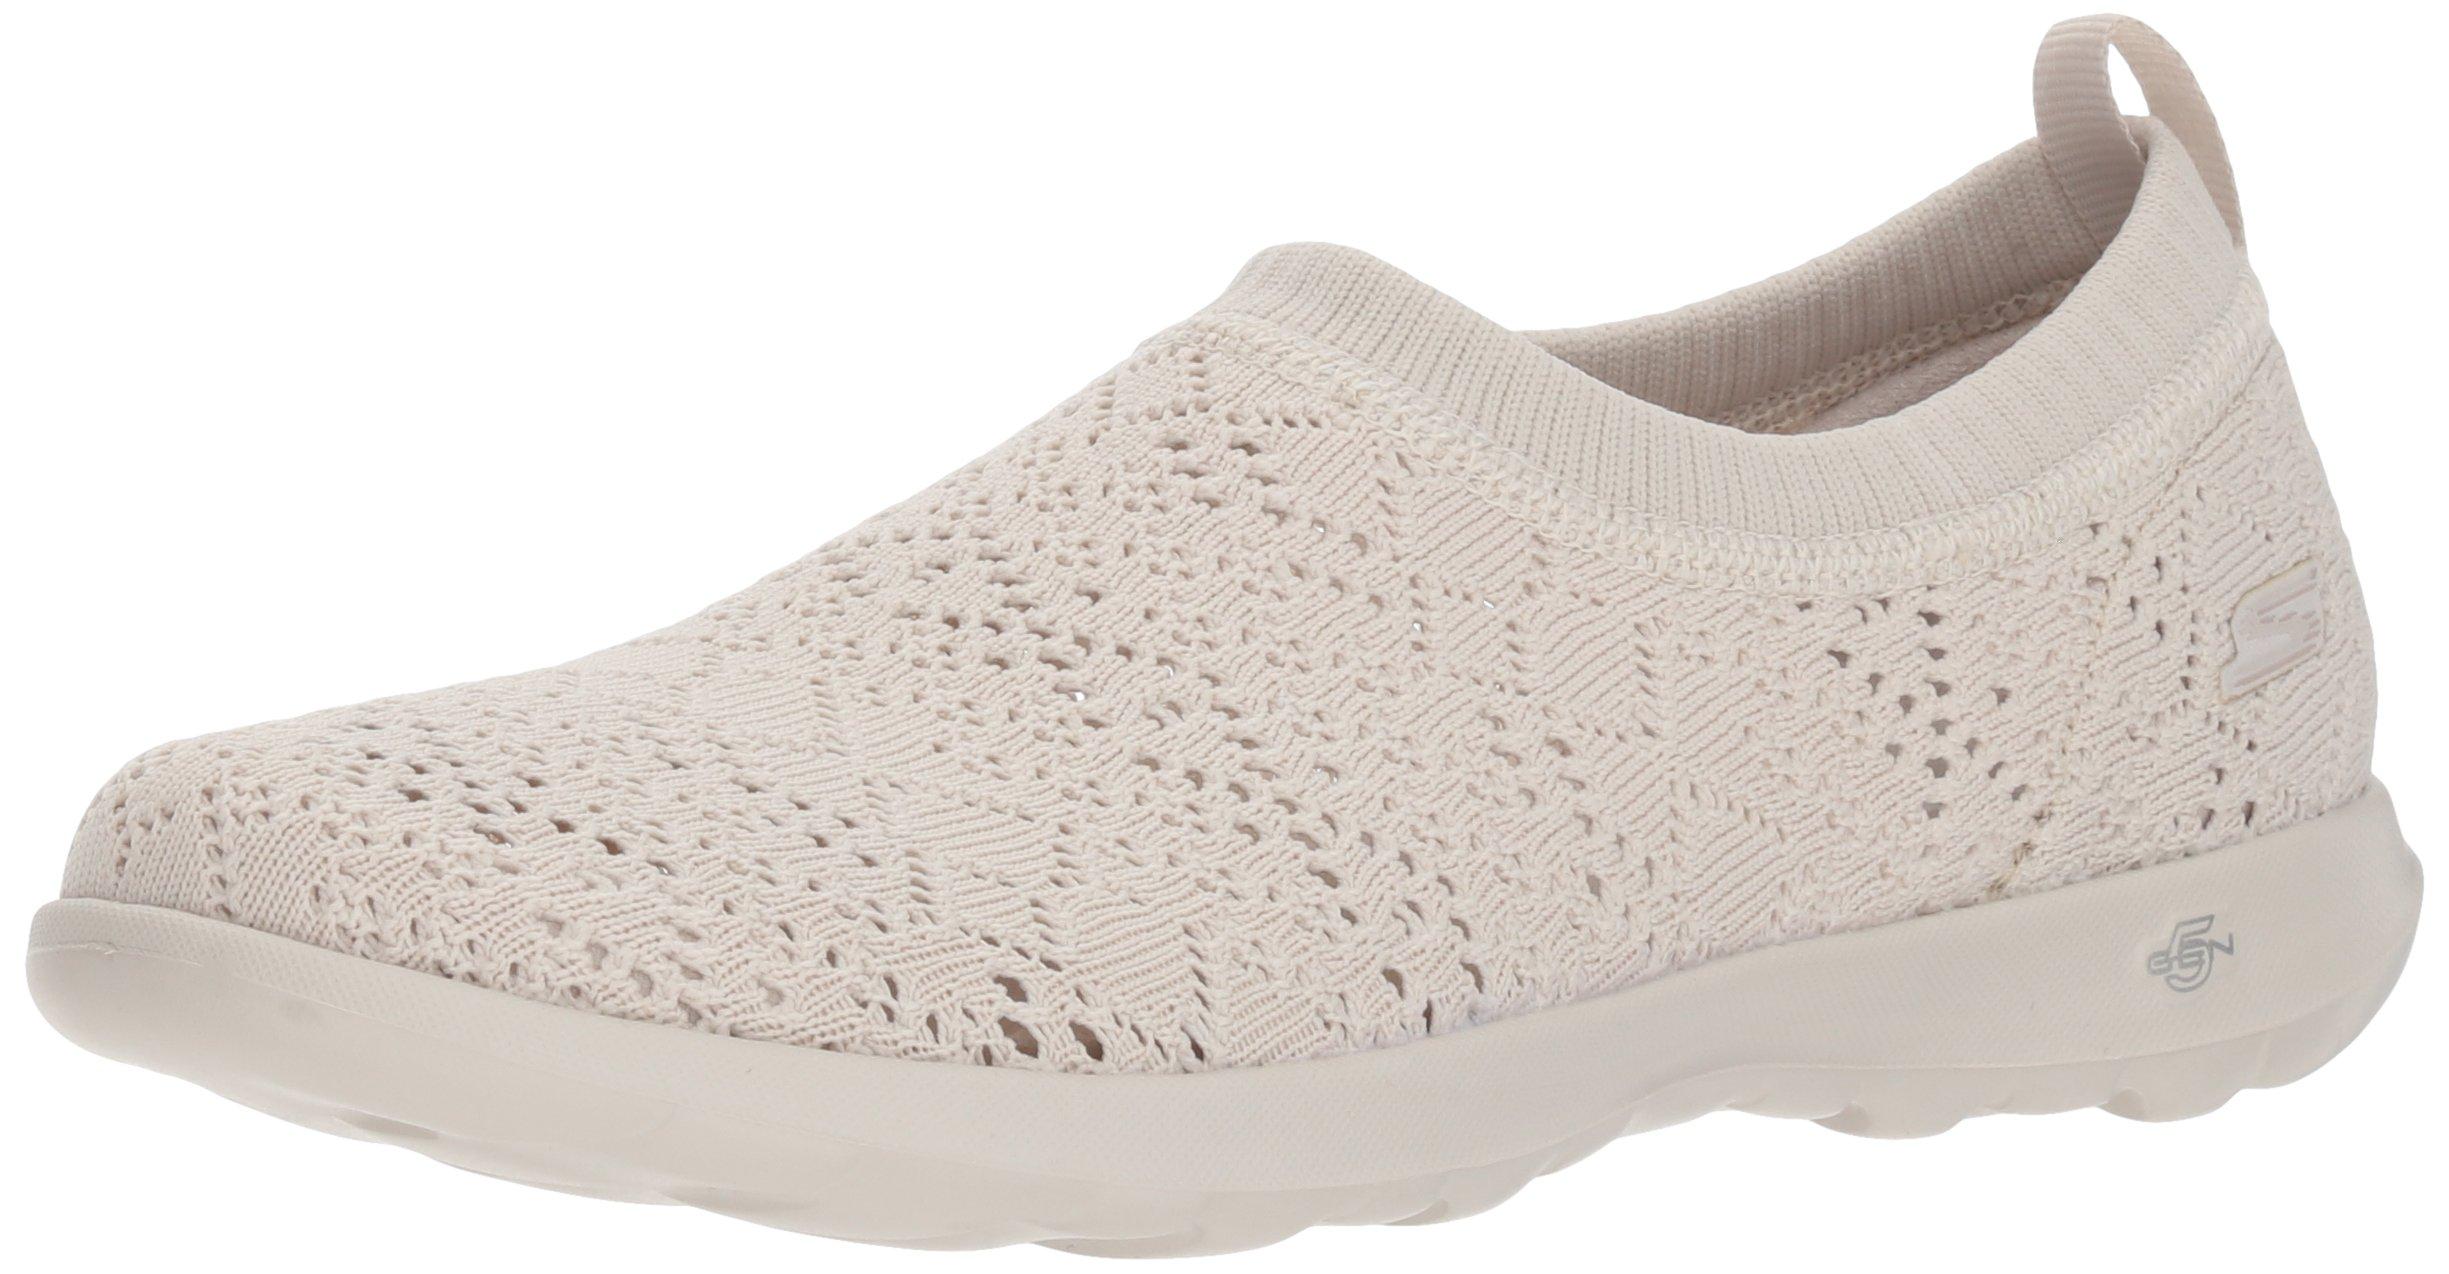 Skechers Women's Go Walk Lite-15385 Loafer,Natural,7 M US